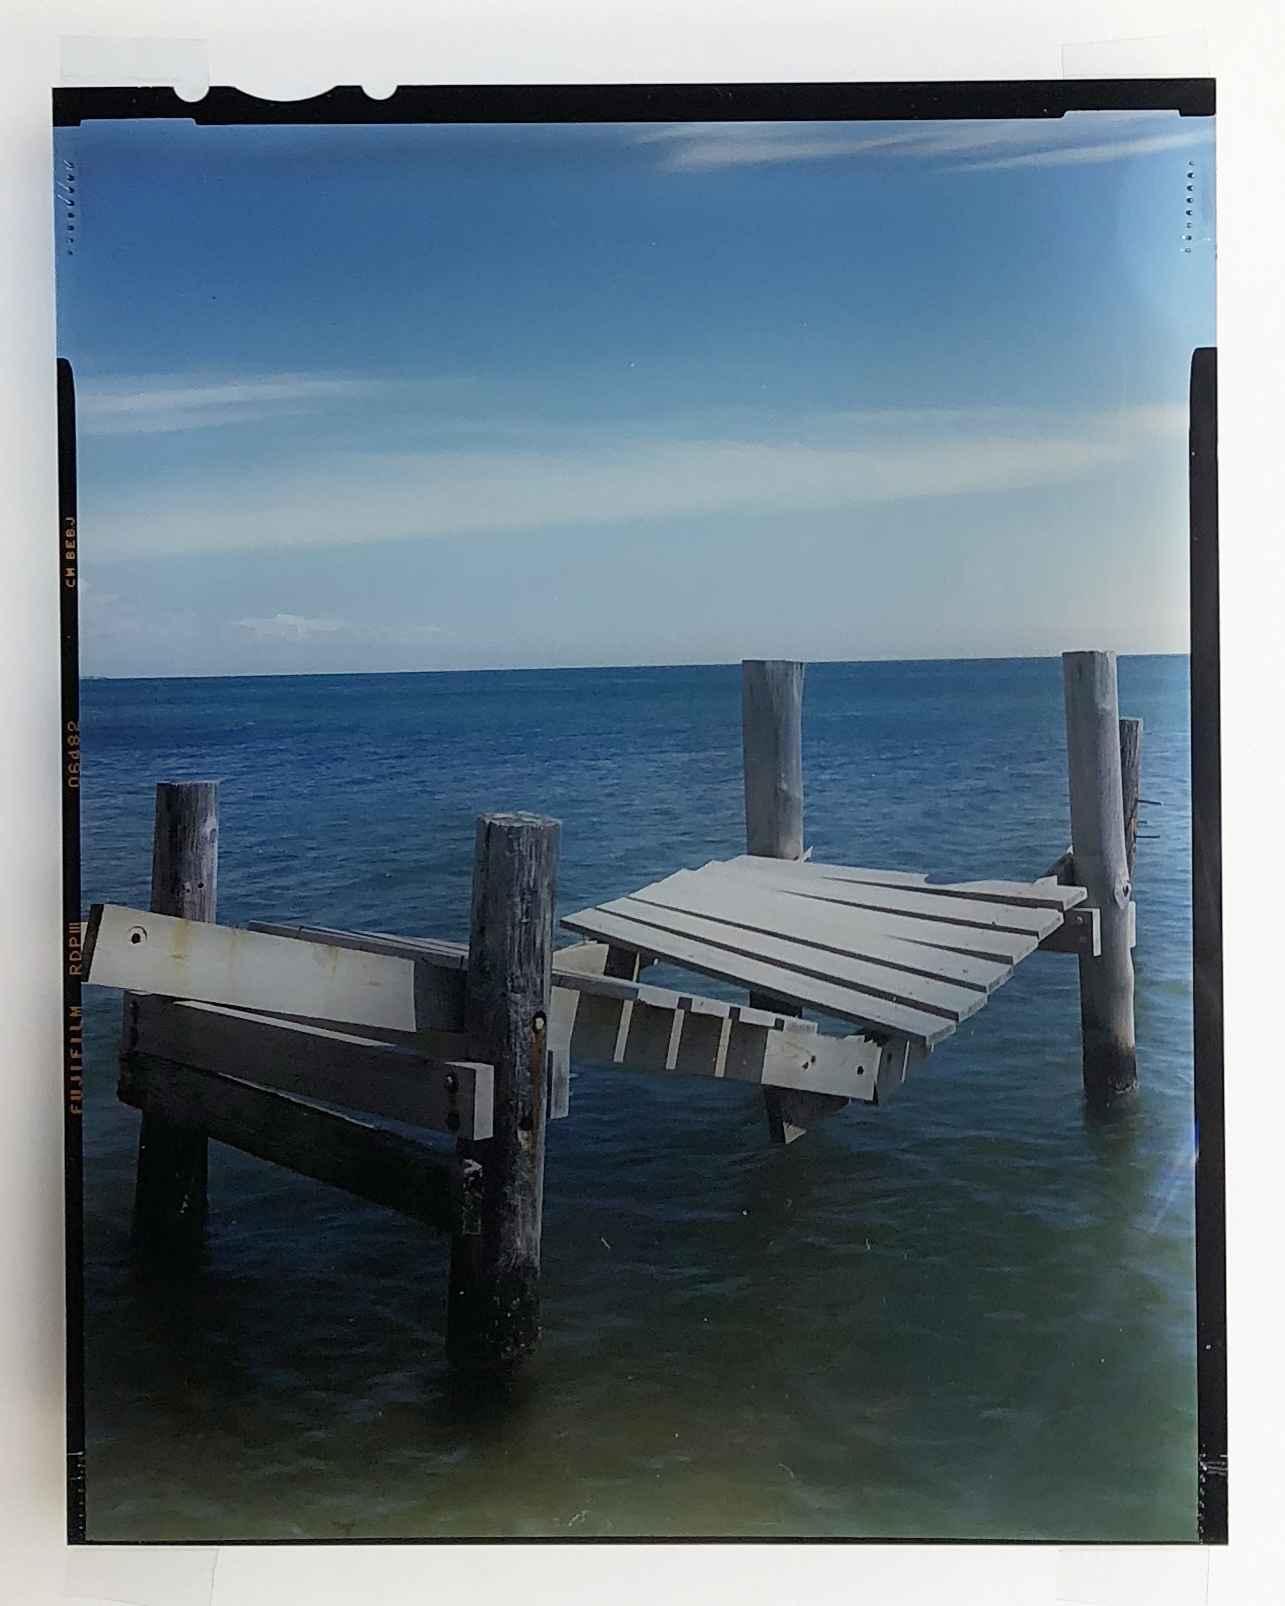 West Chop Dock, After... by  Jhenn Watts - Masterpiece Online